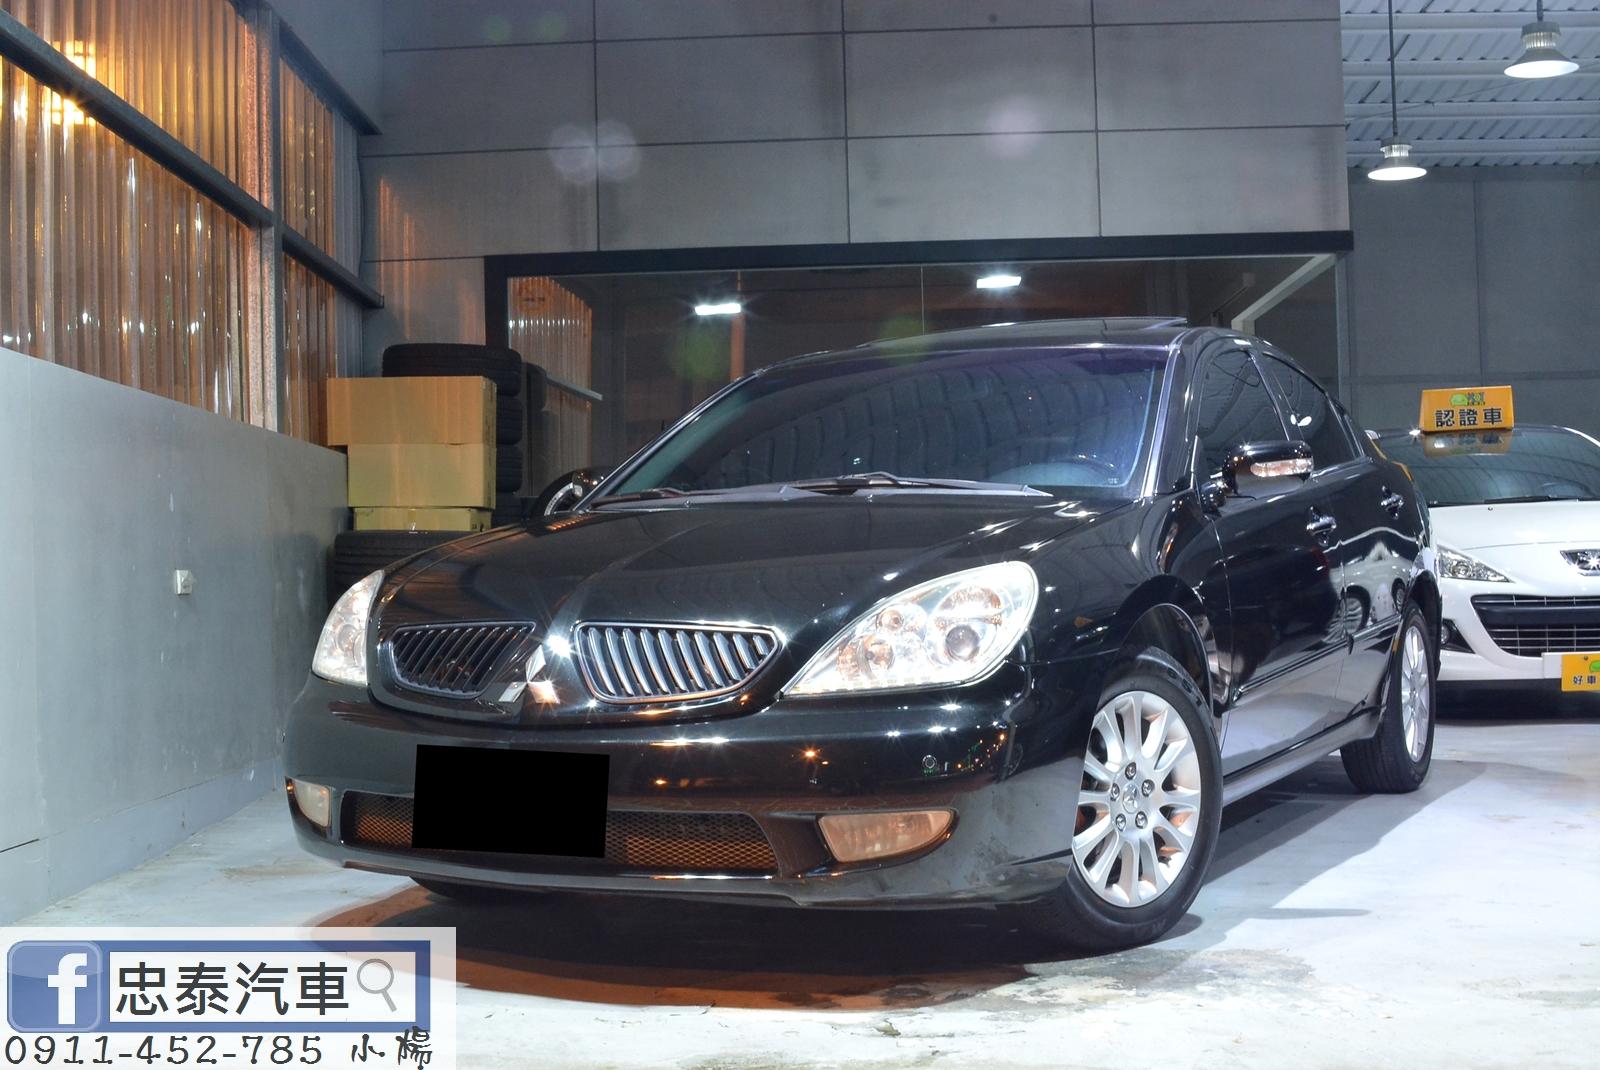 2006 Mitsubishi 三菱 Grunder